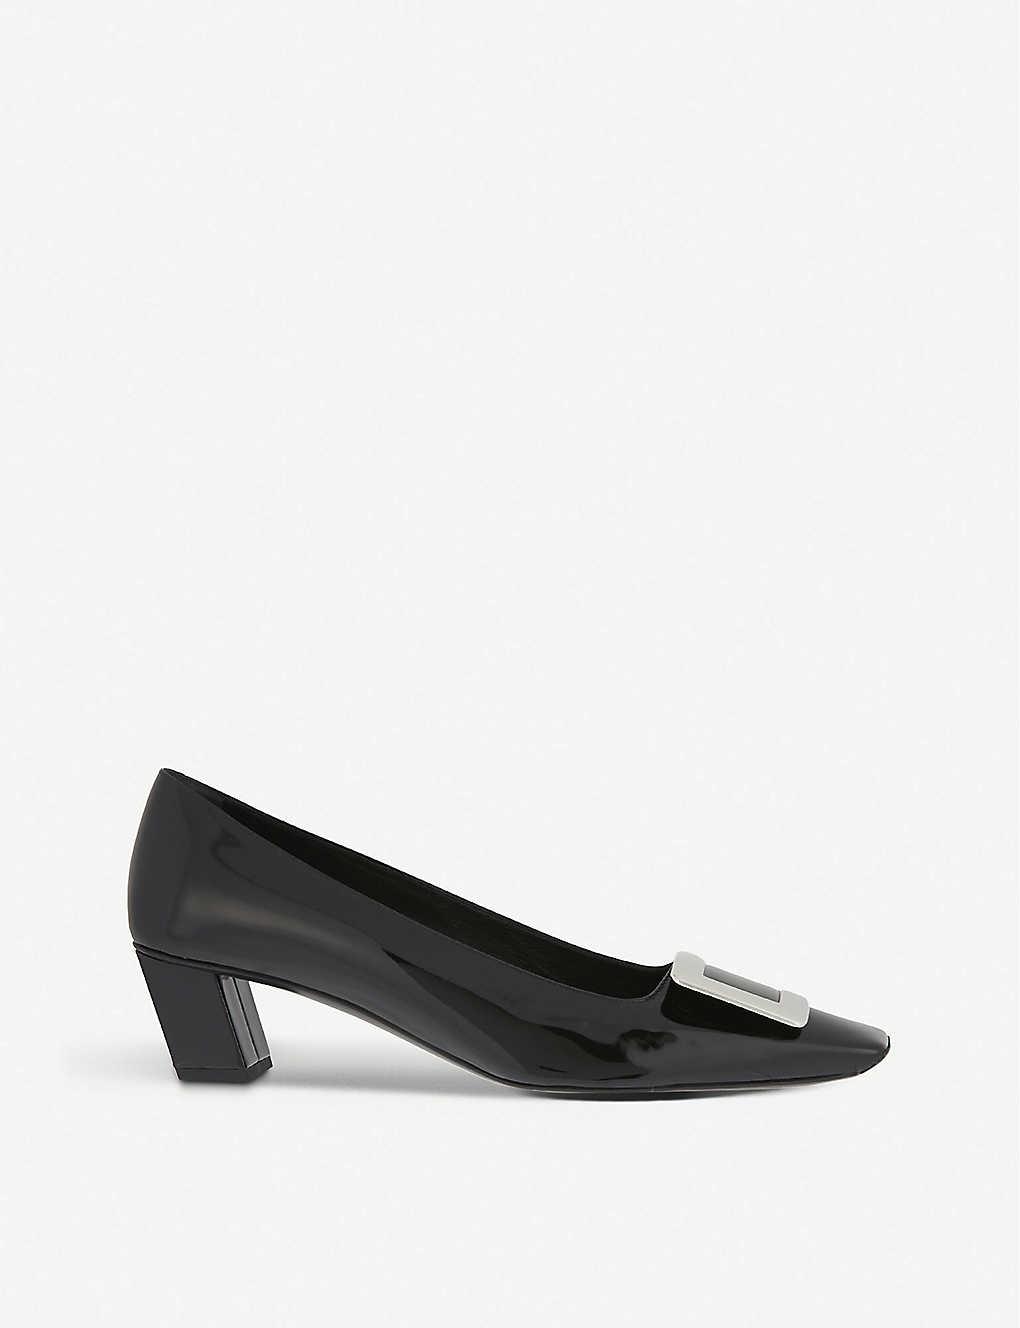 Belle Vivier patent-leather courts(2772164)